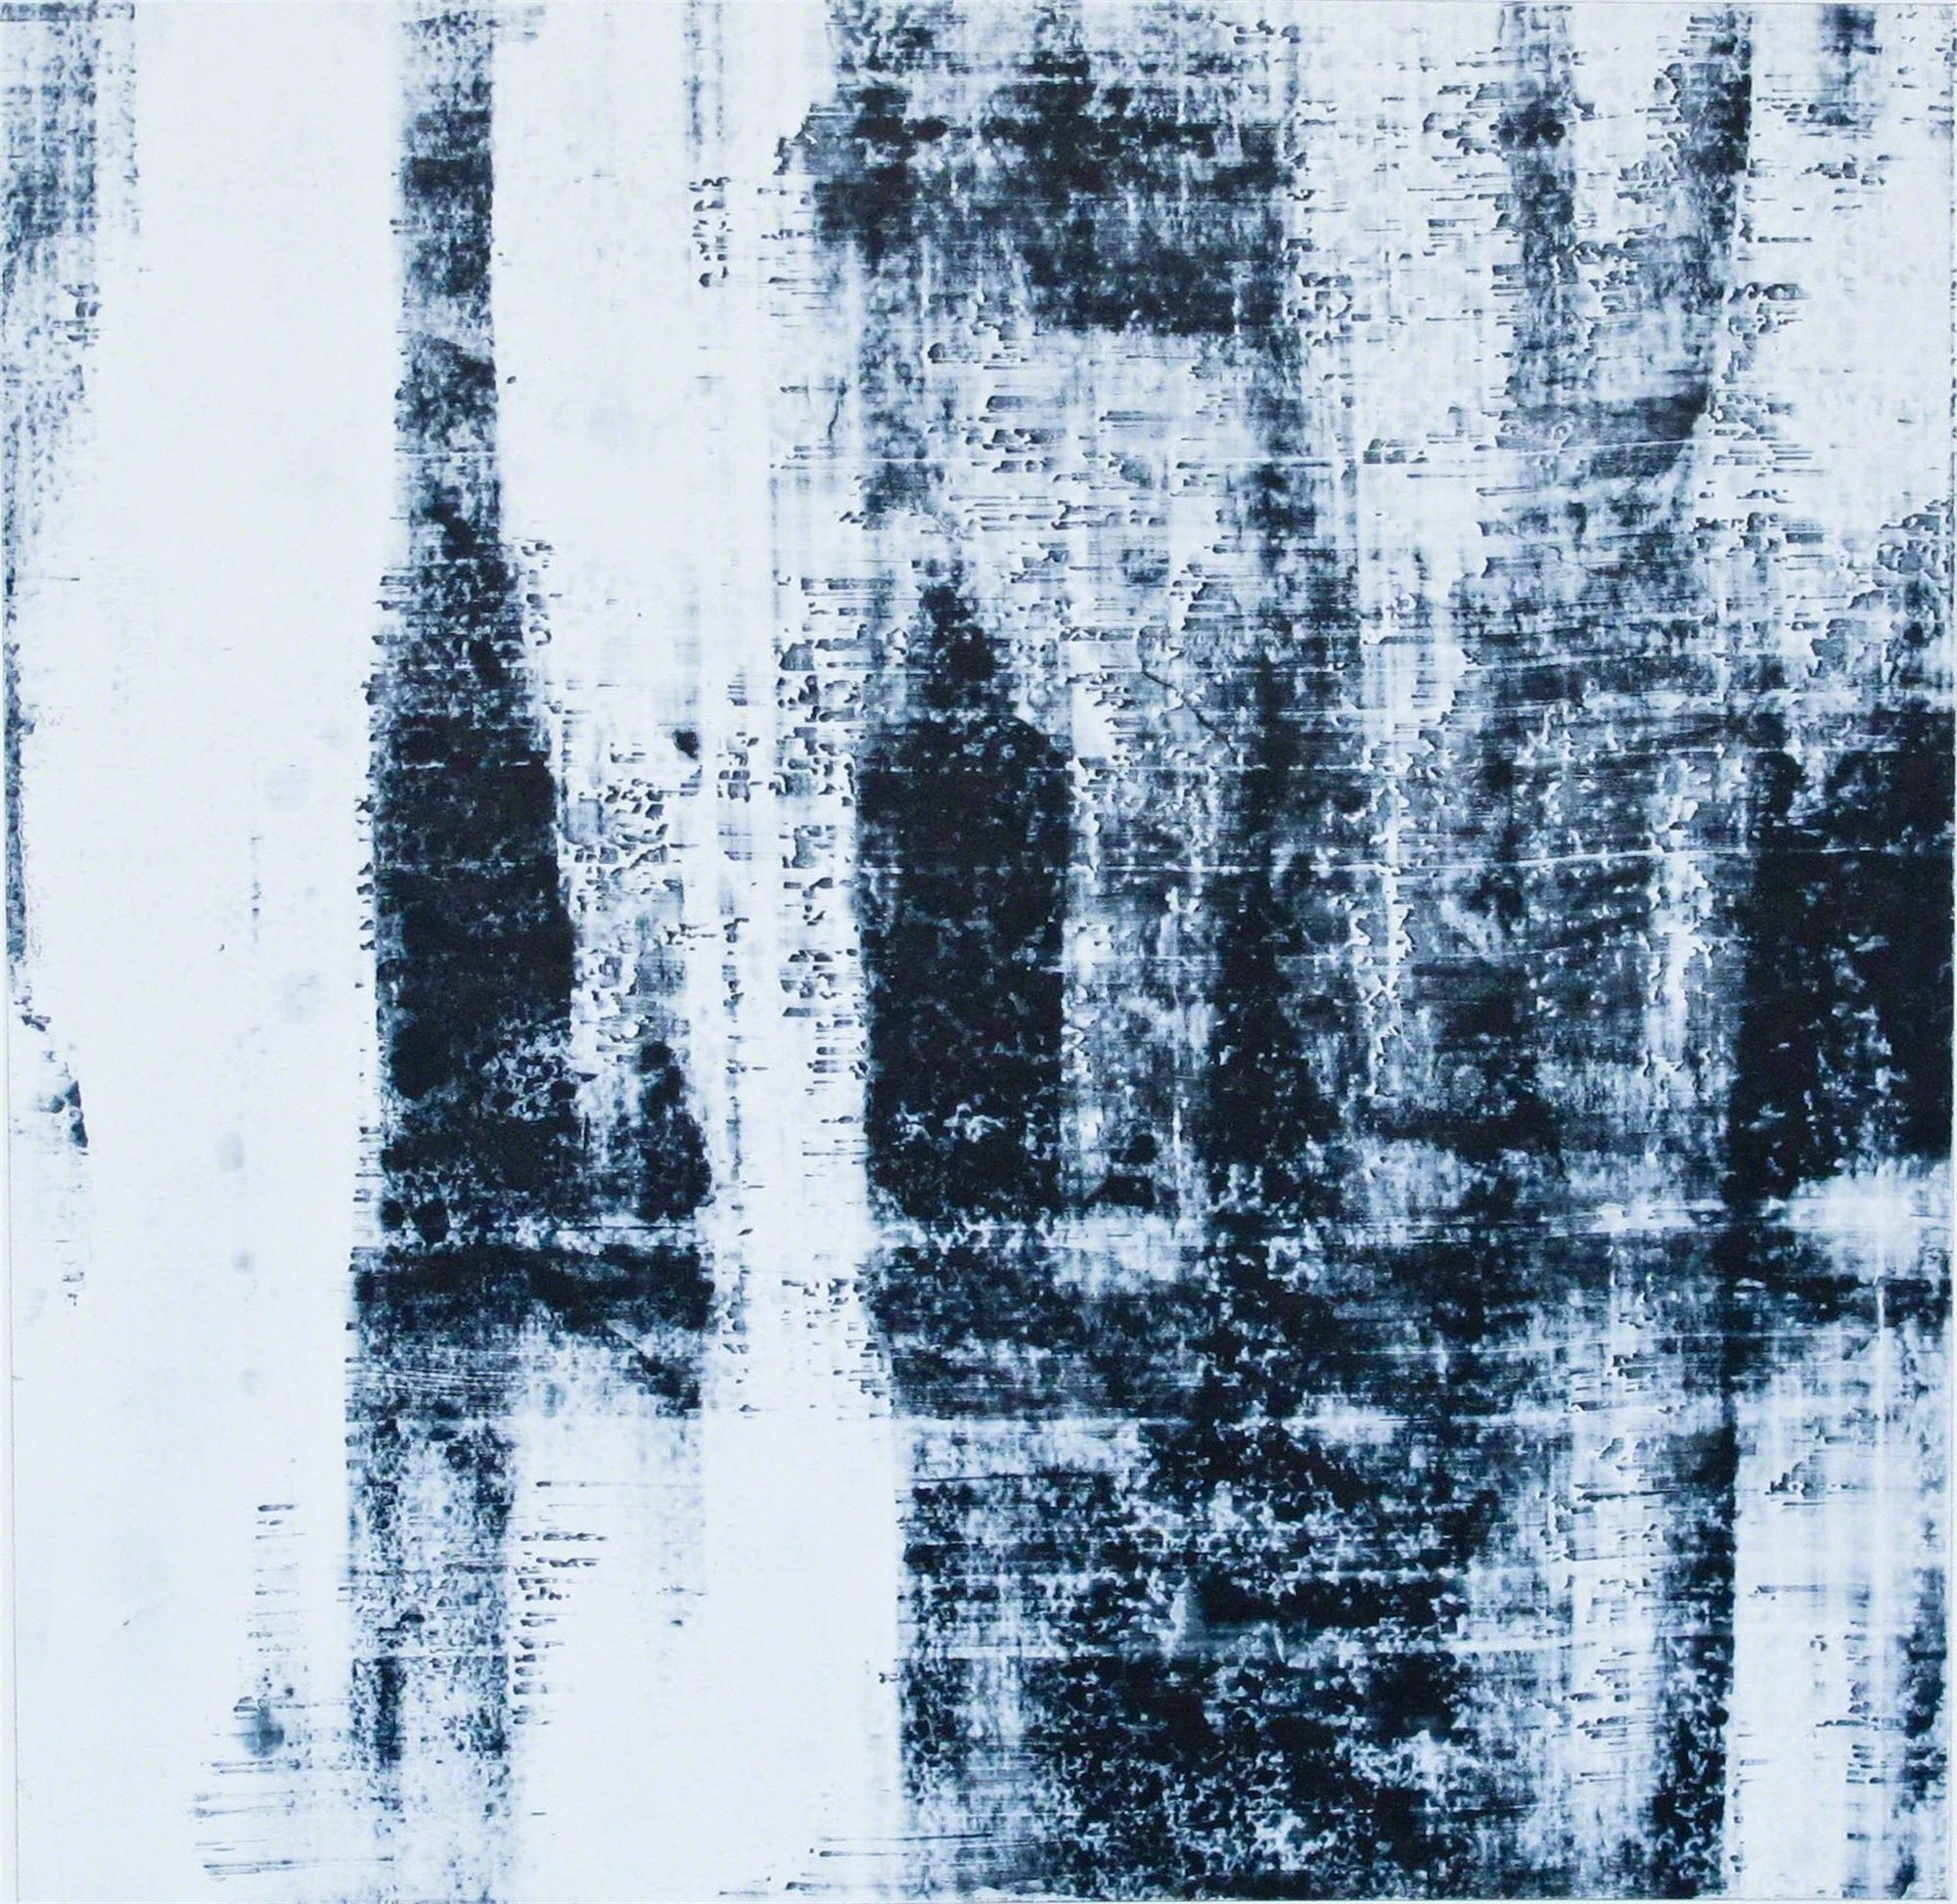 Untitled (18.02.12) by Paul Moran